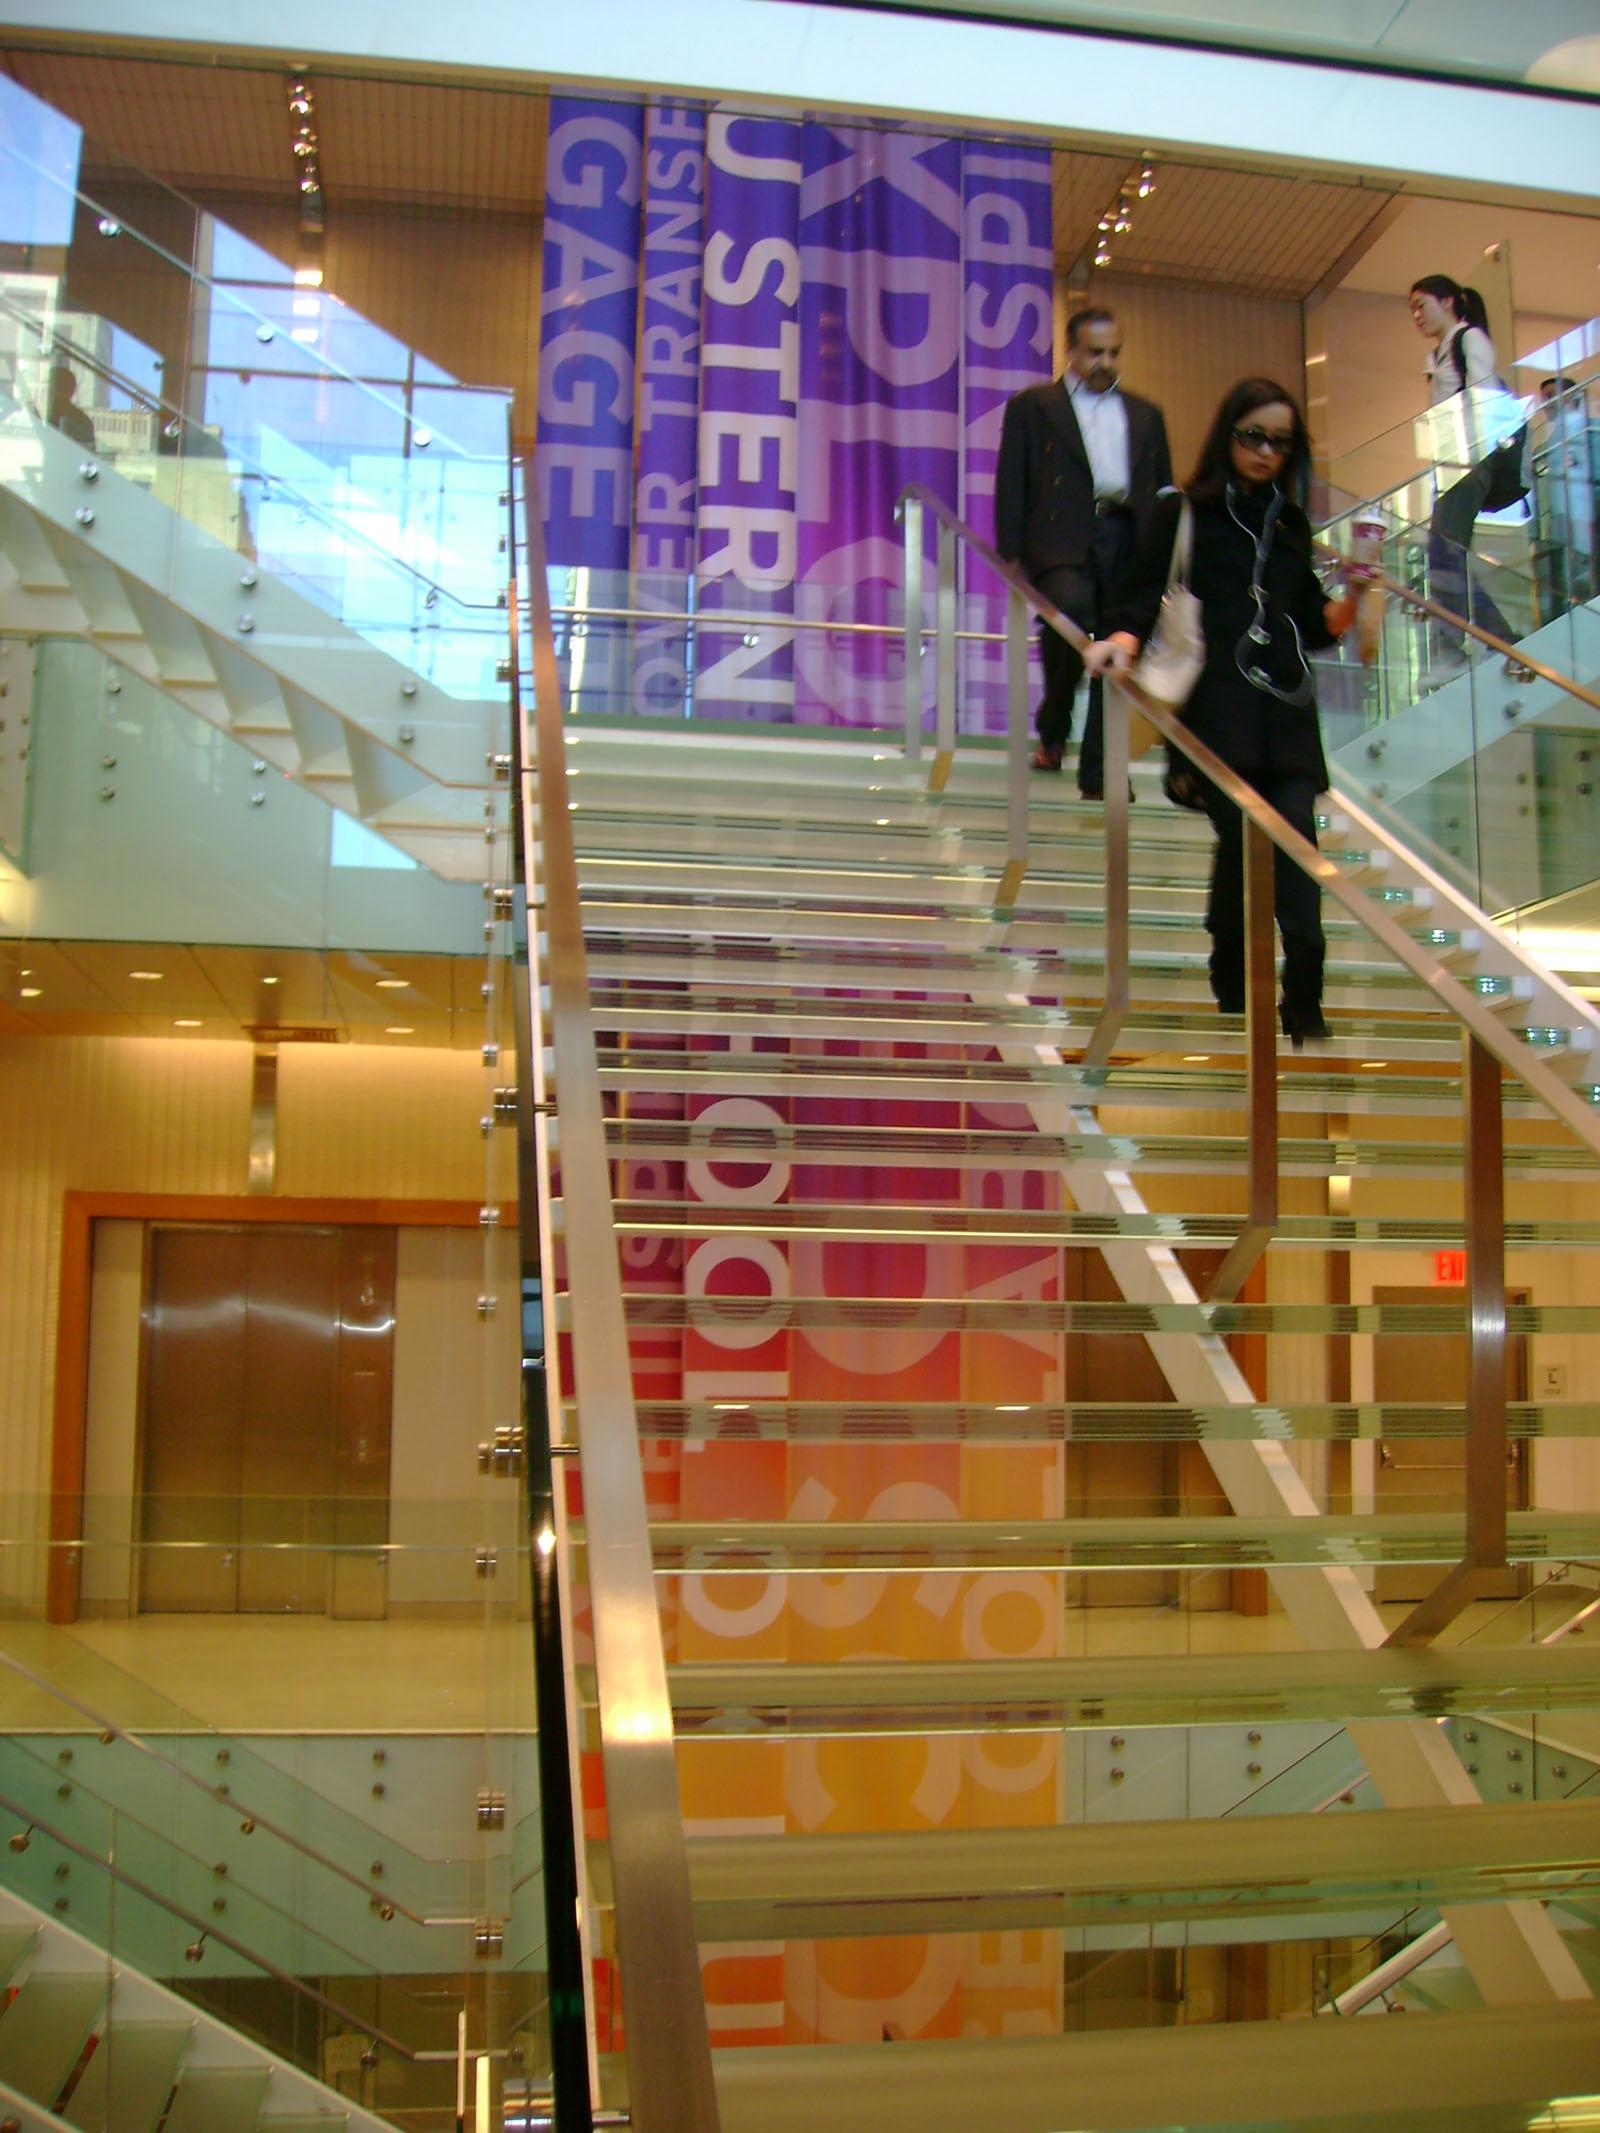 NYU Stern School of Business Lobby